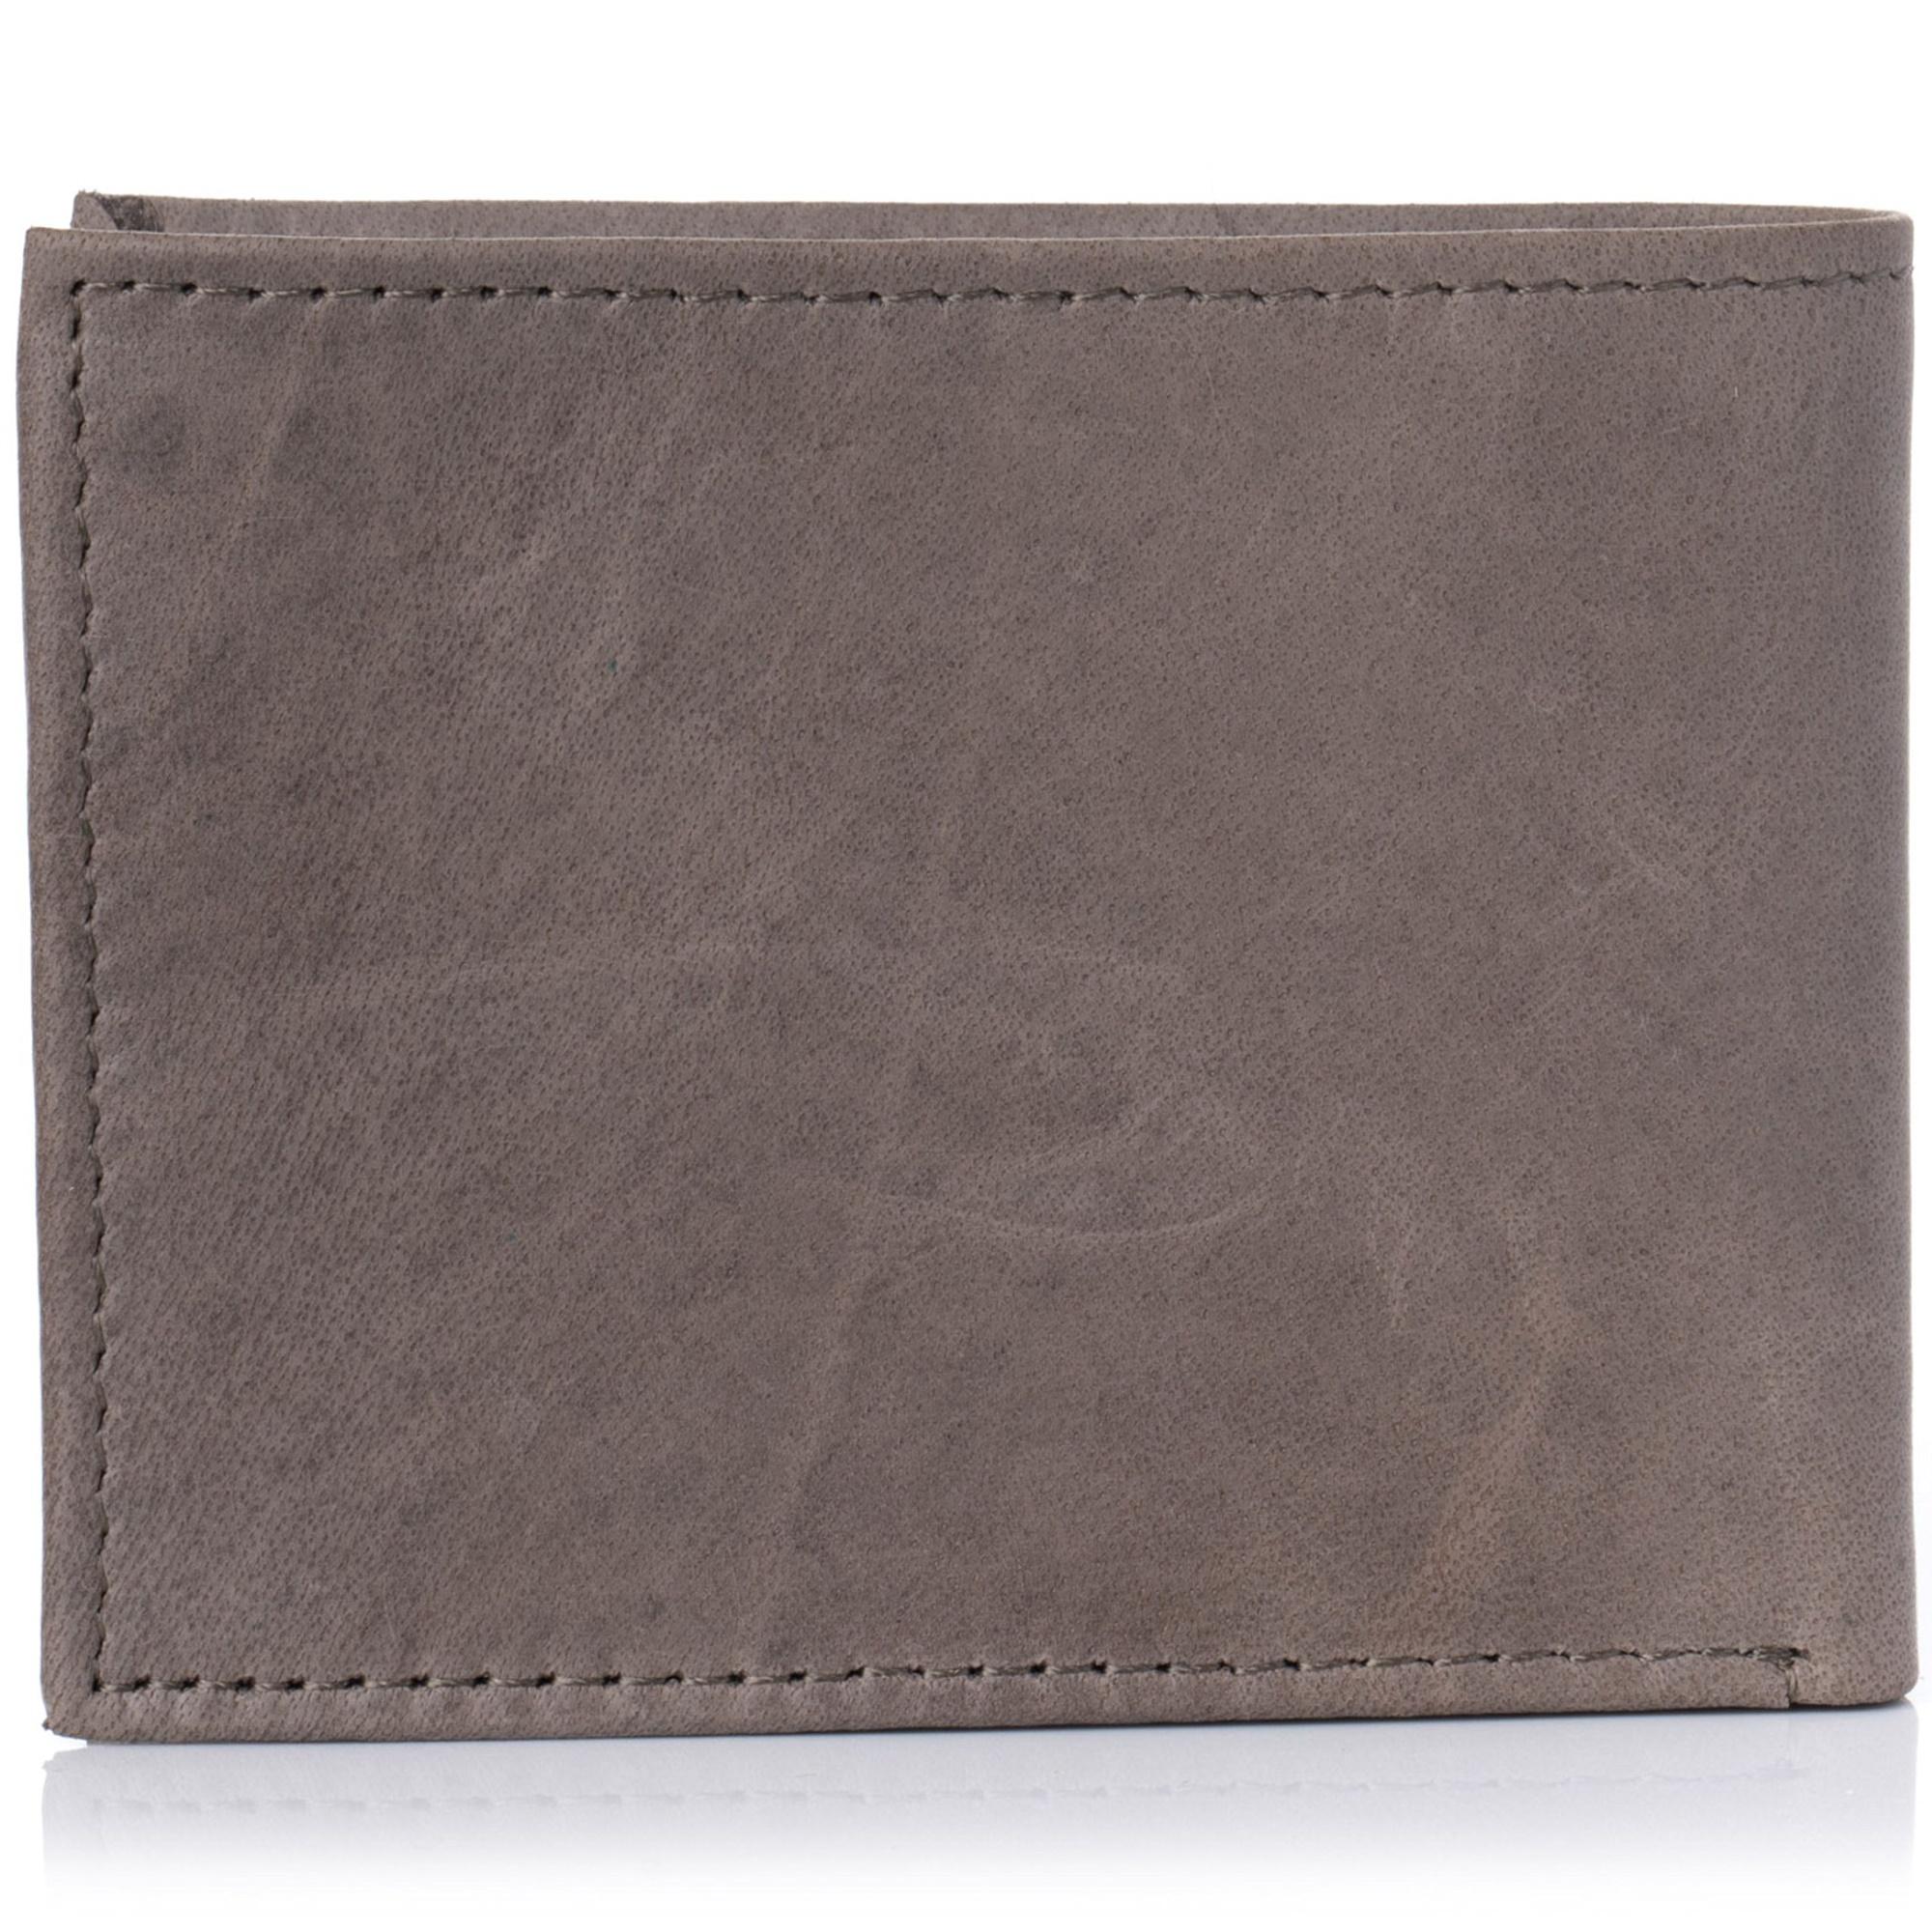 Alpine-Swiss-Mens-RFID-Blocking-Leather-Wallet-Multi-Card-High-Capacity-Bifold thumbnail 39